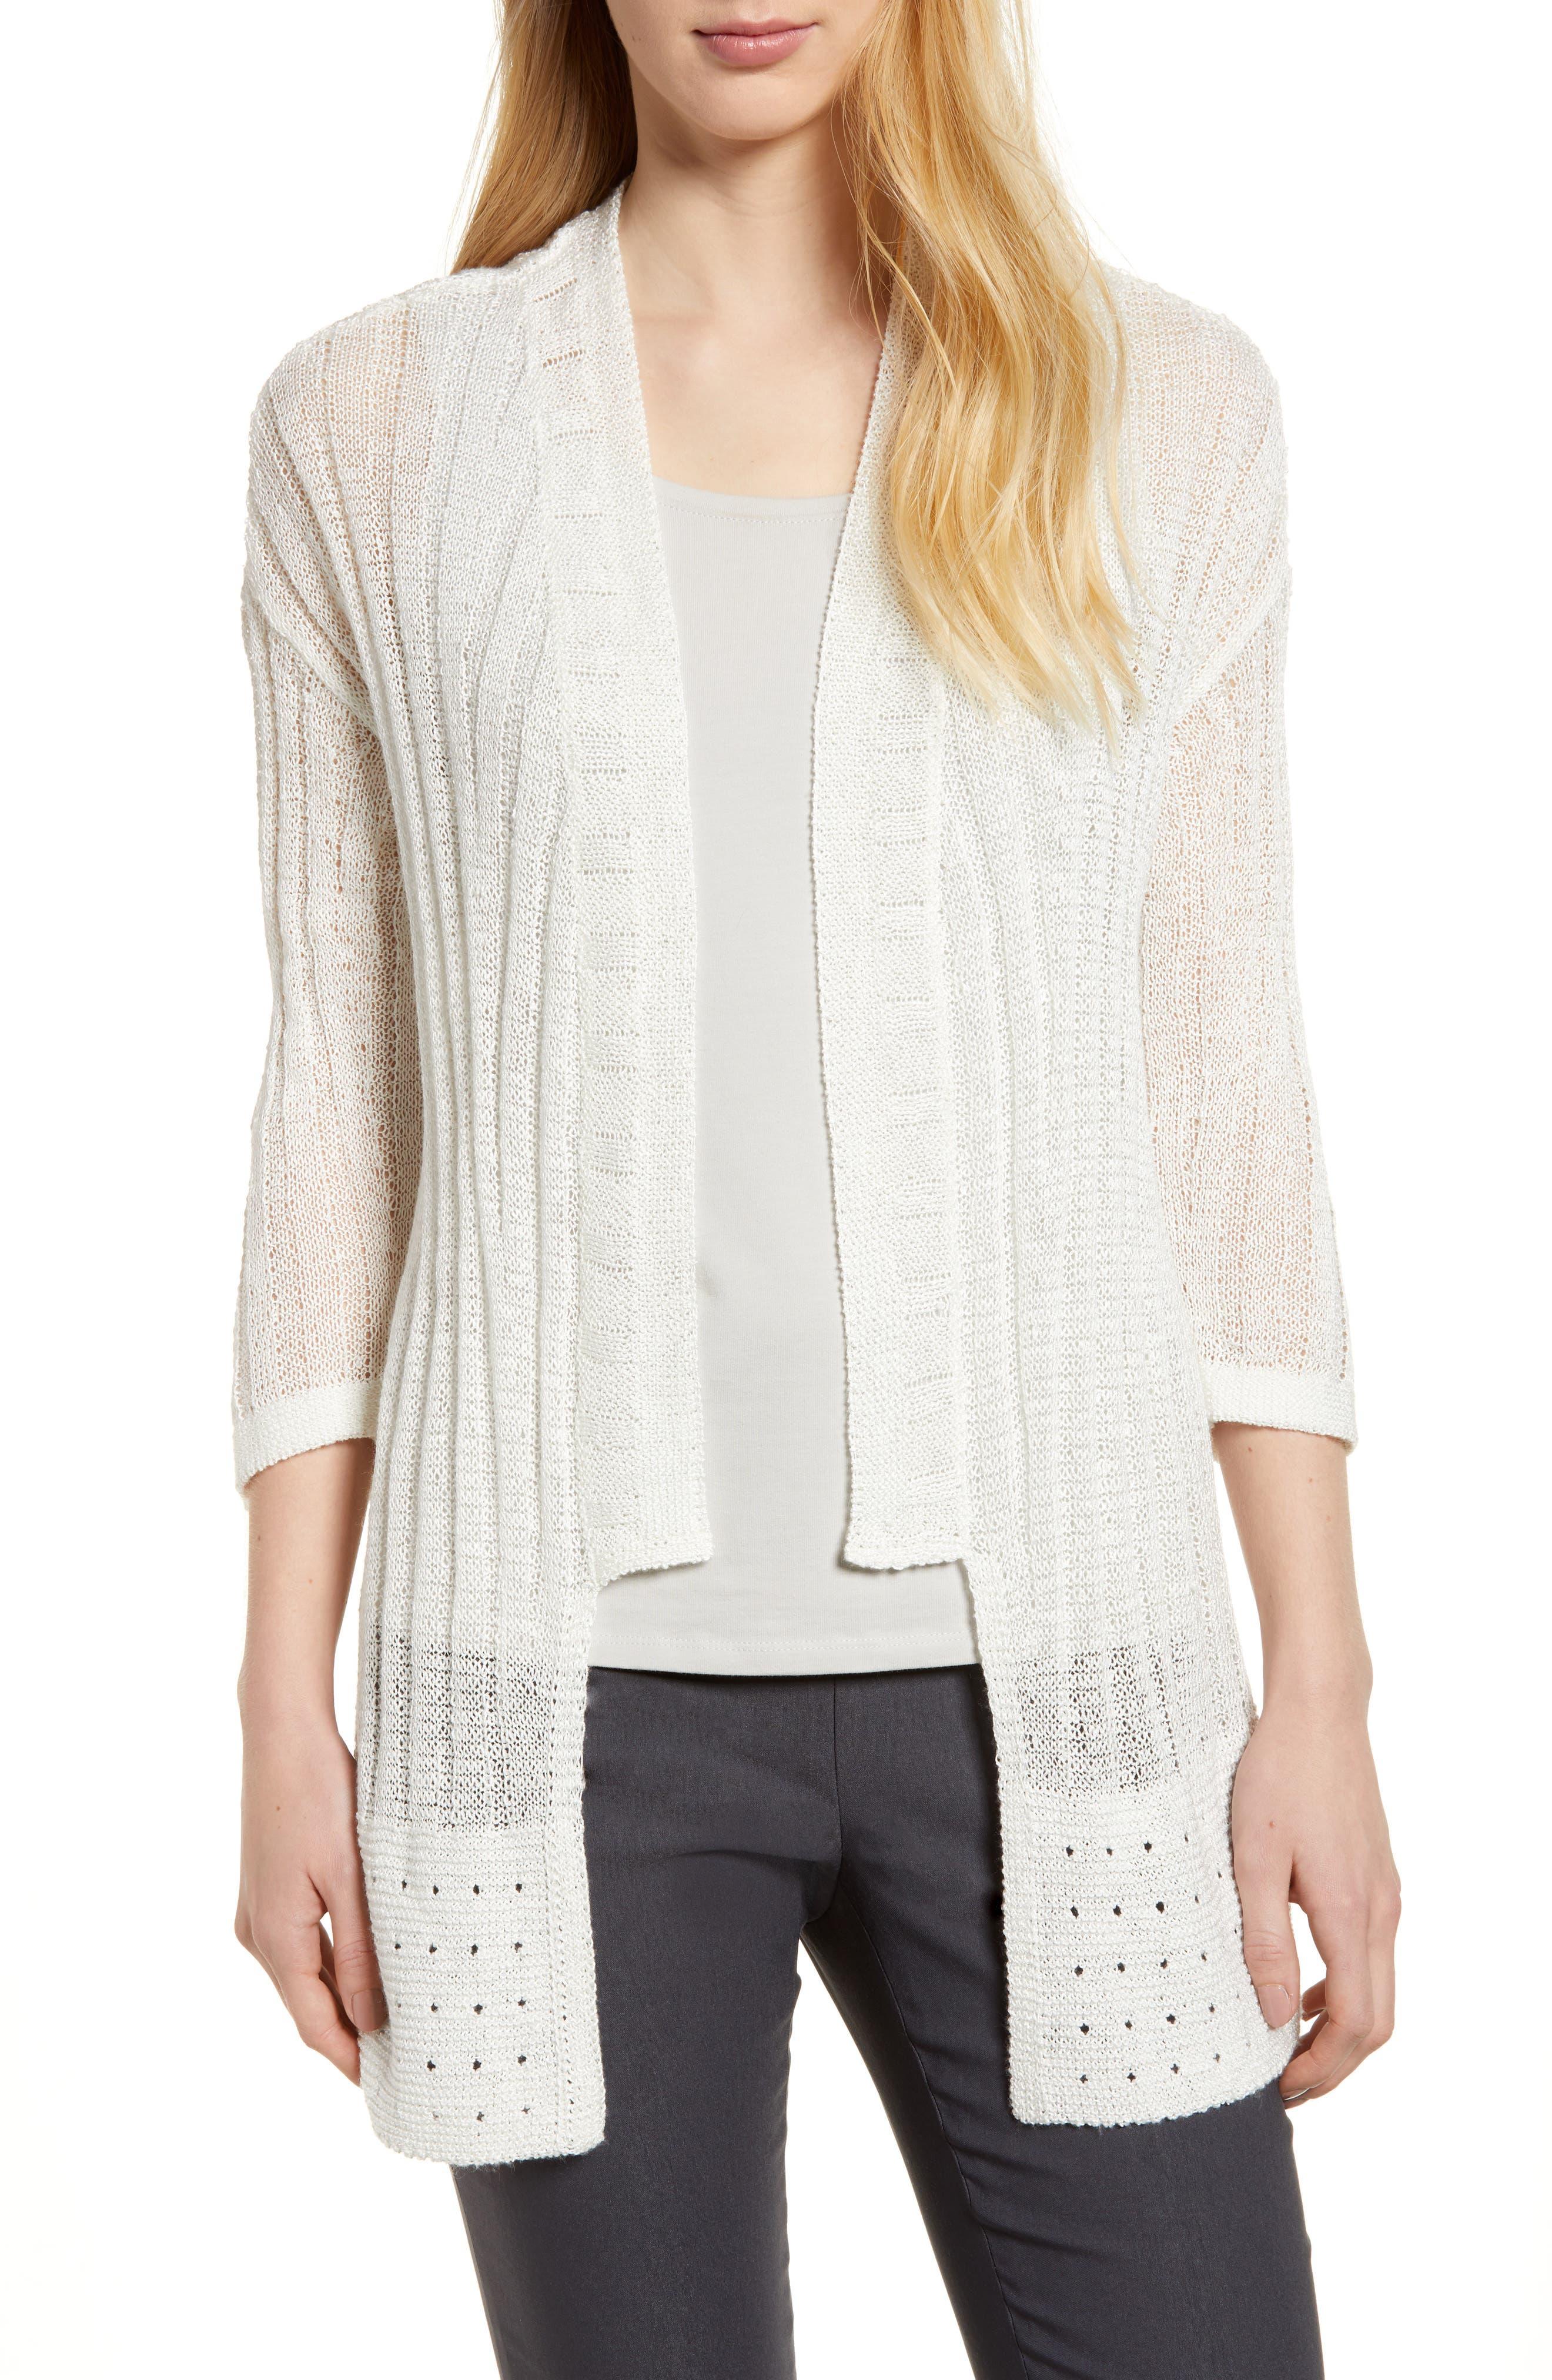 Changing Tides Linen Blend Open Front Cardigan,                         Main,                         color, Milk White